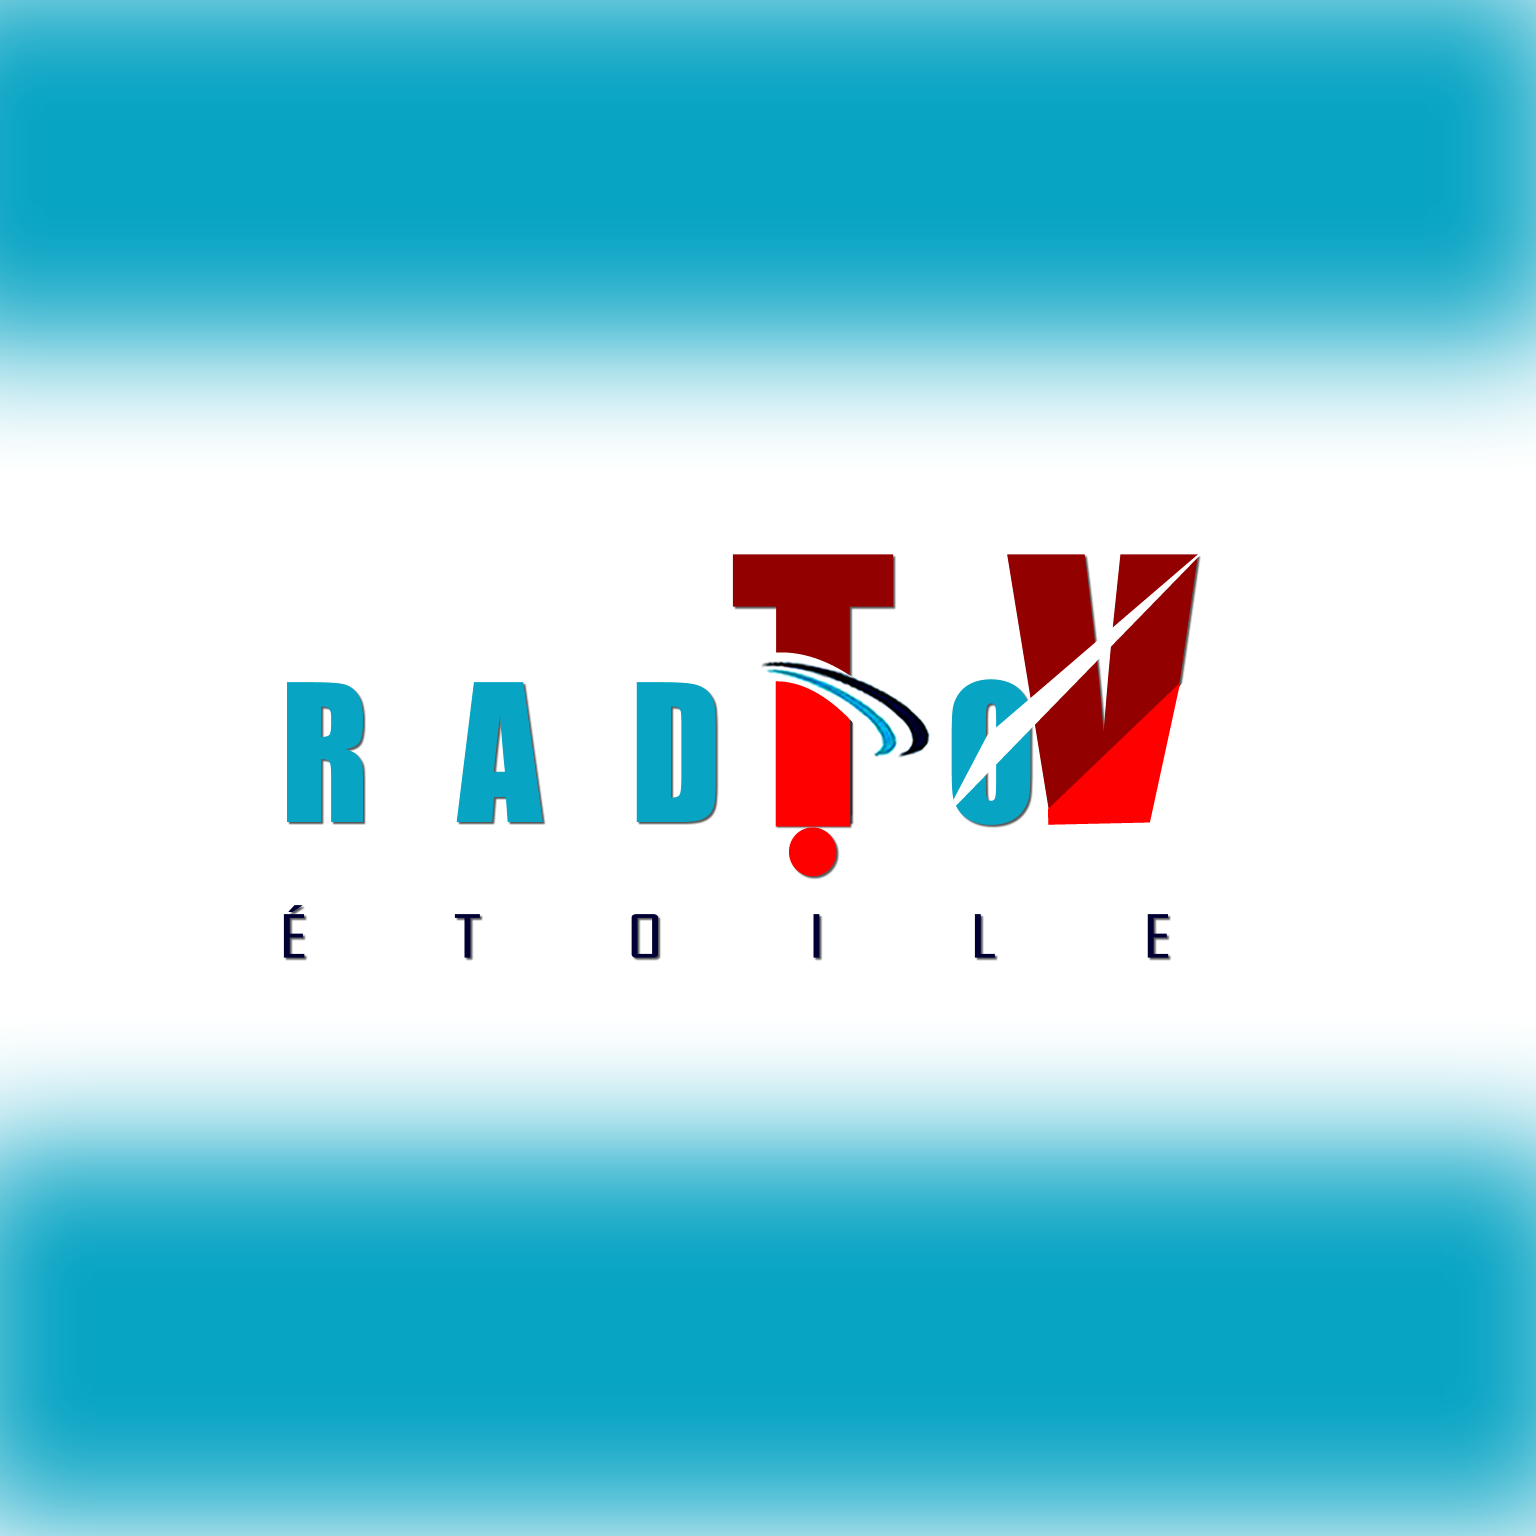 Radio Etoile